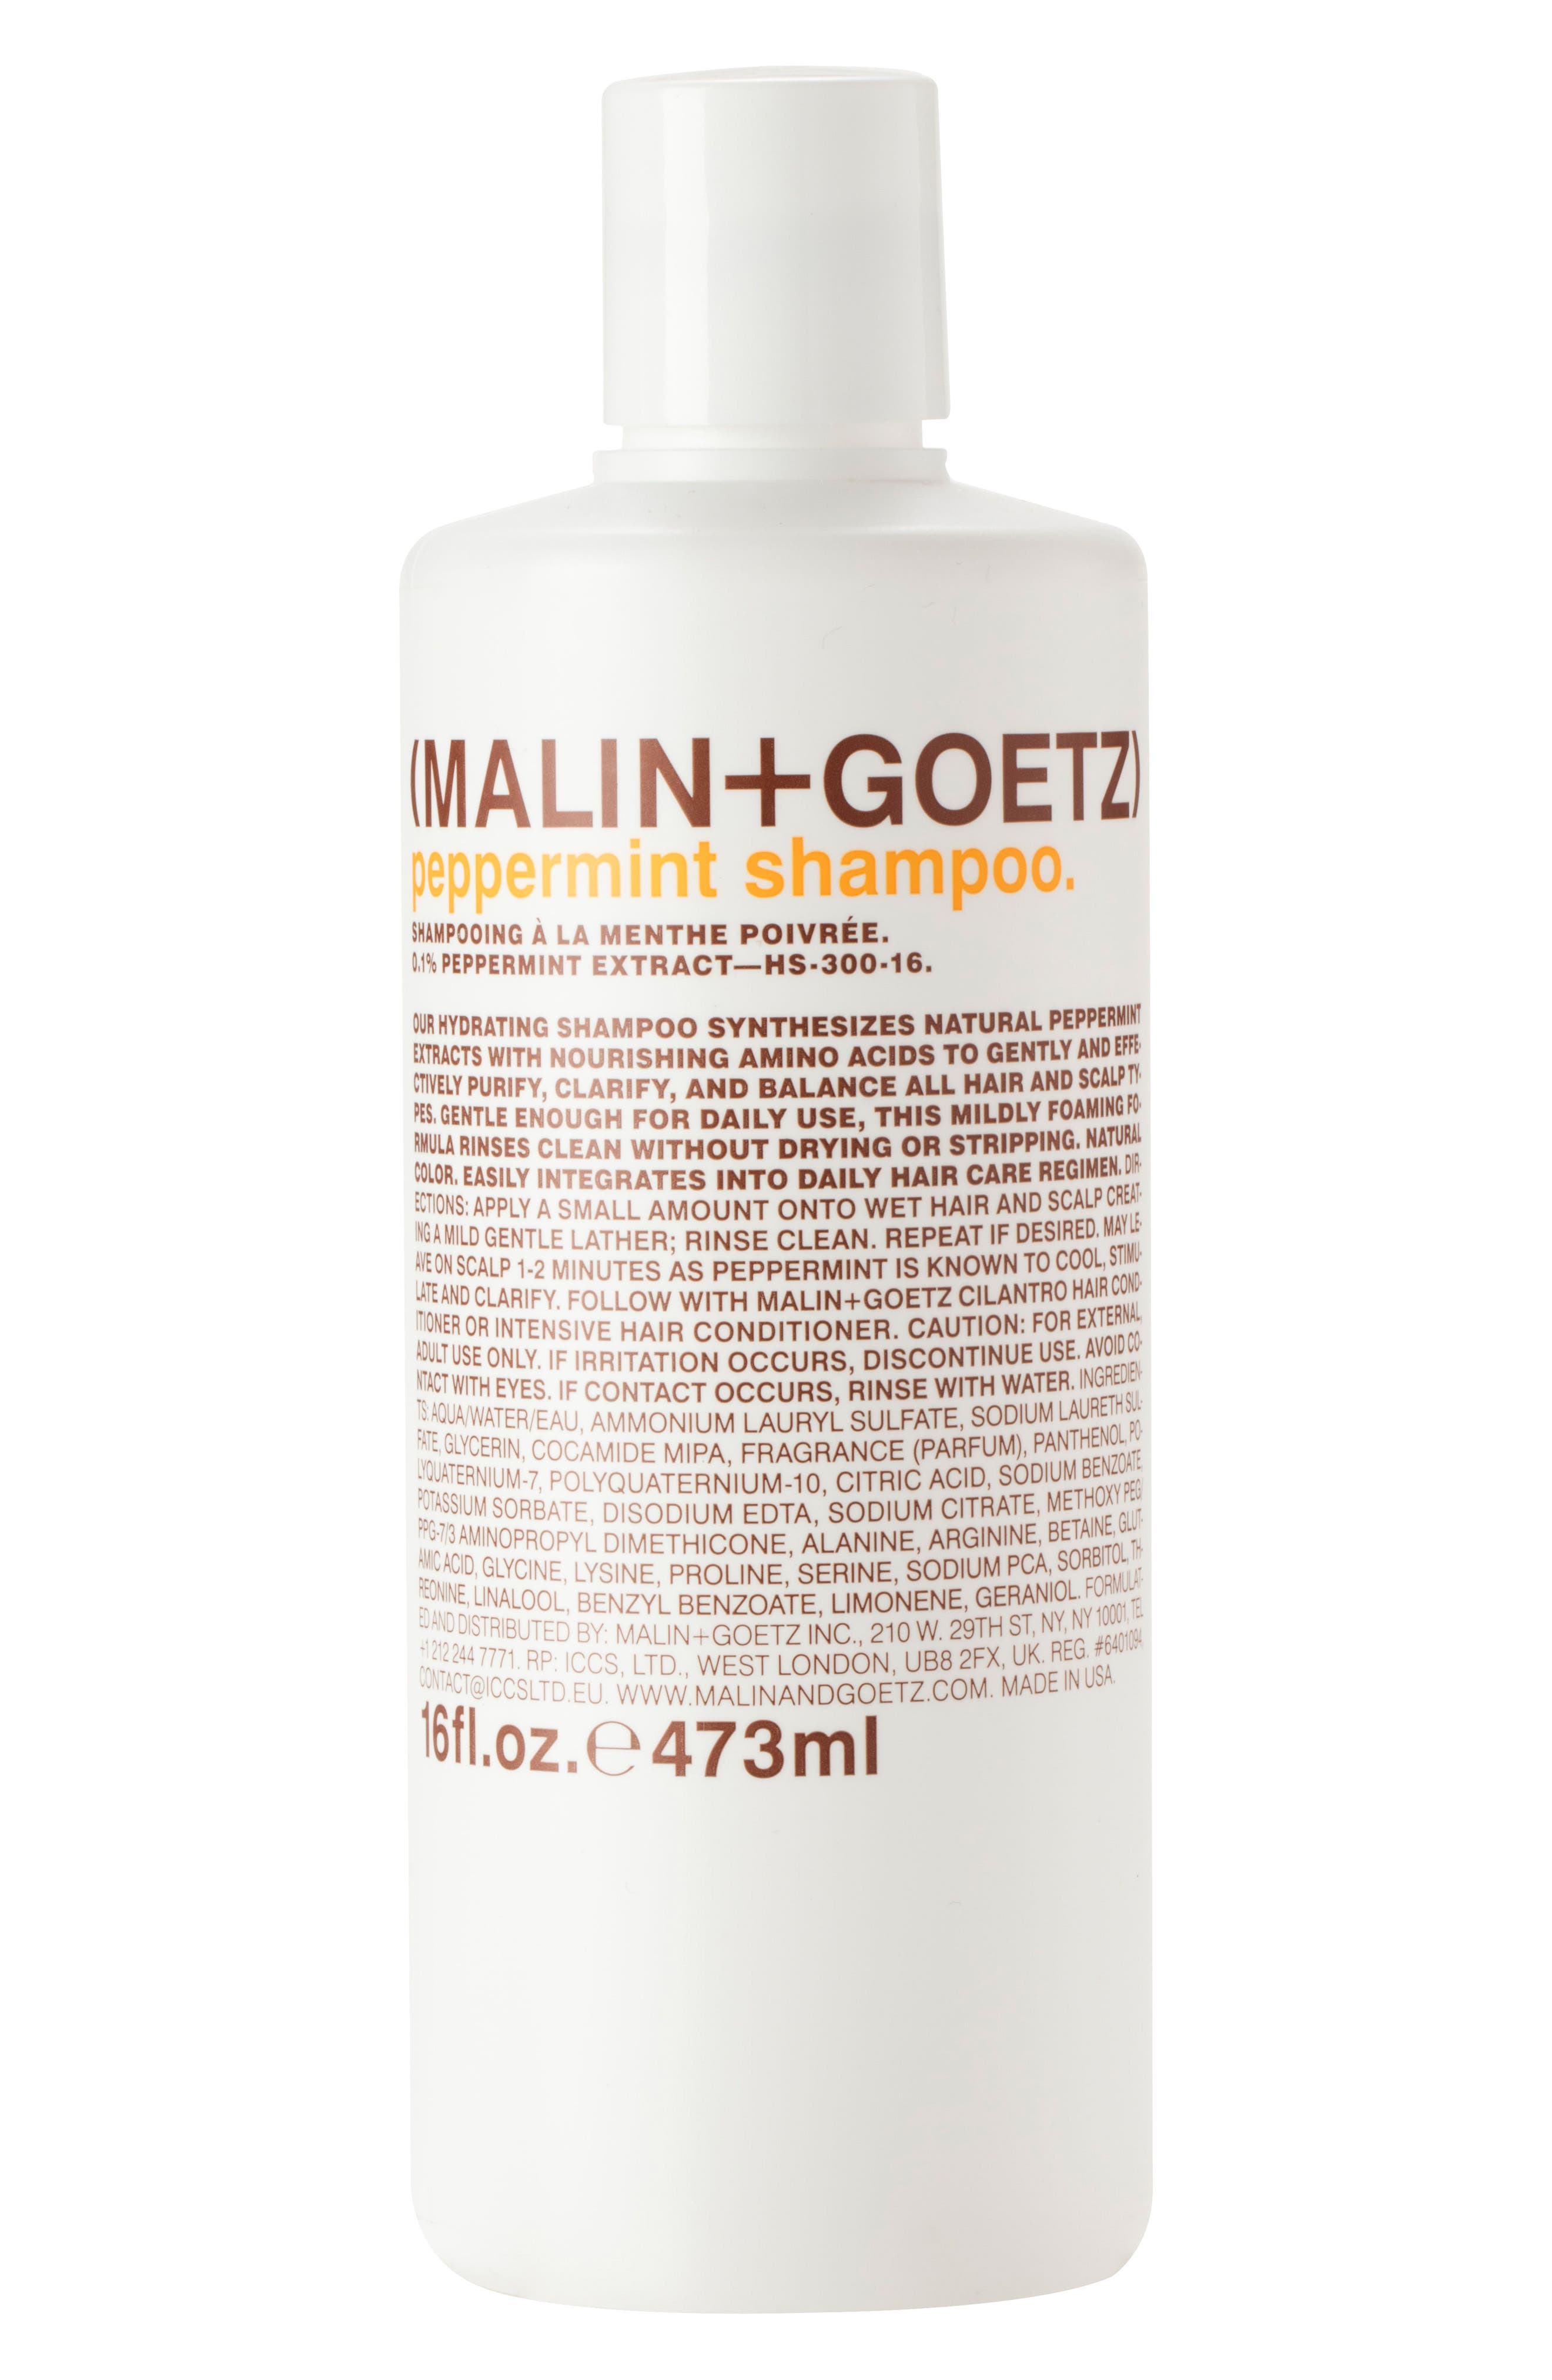 Alternate Image 1 Selected - MALIN+GOETZ Peppermint Shampoo